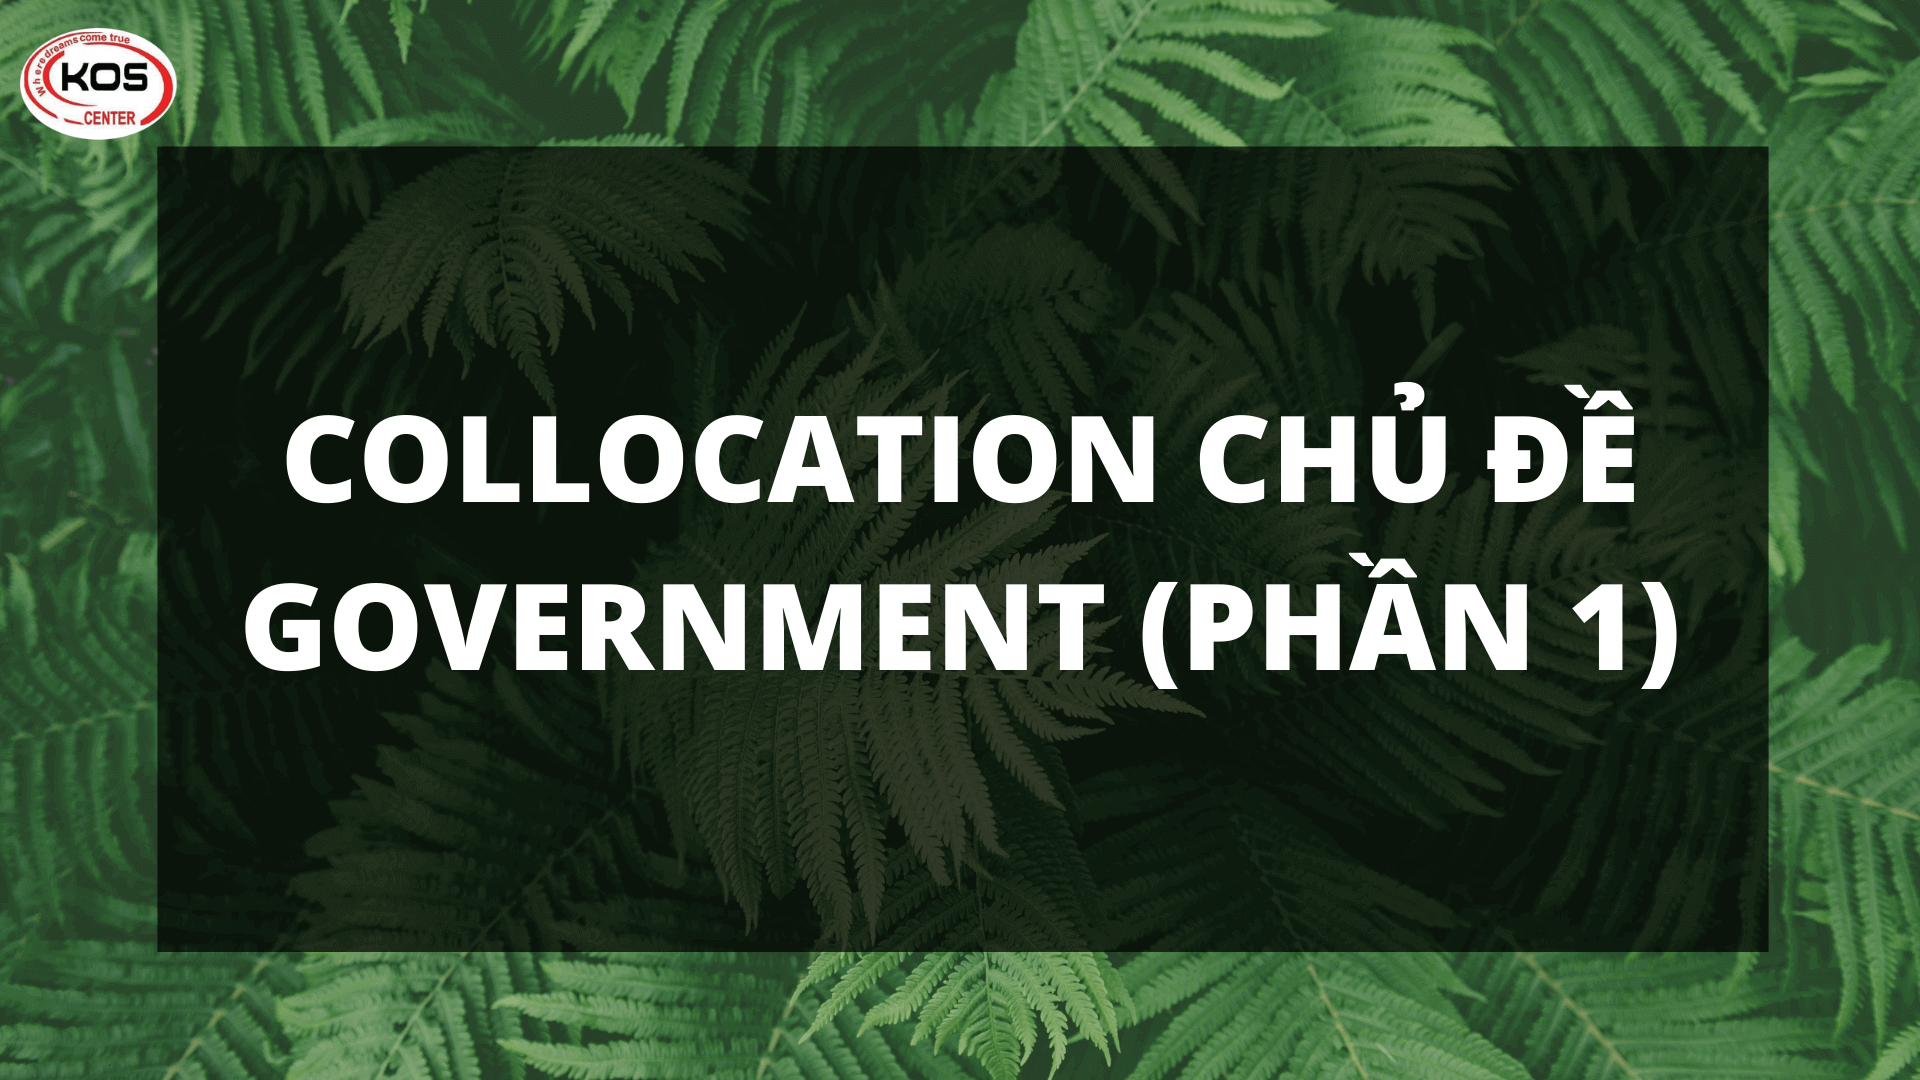 Collocation chủ đề Government